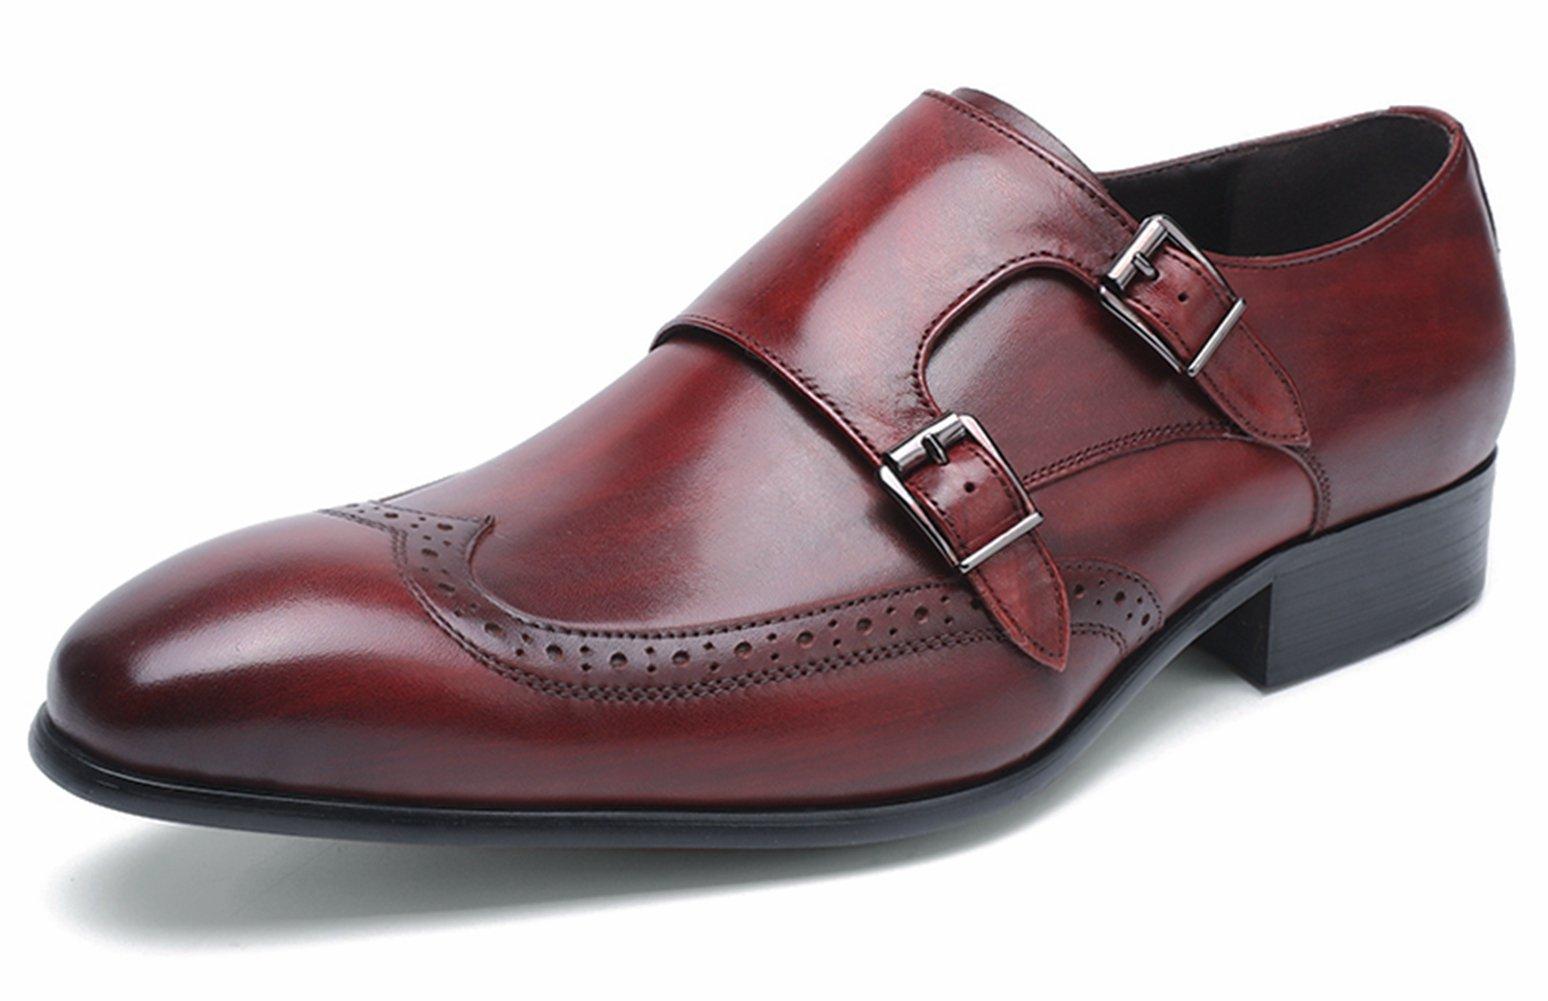 Felix Chu Men's fashion Color leather shoes Men double breasted shoes Men Weddings dress shoes business office shoes